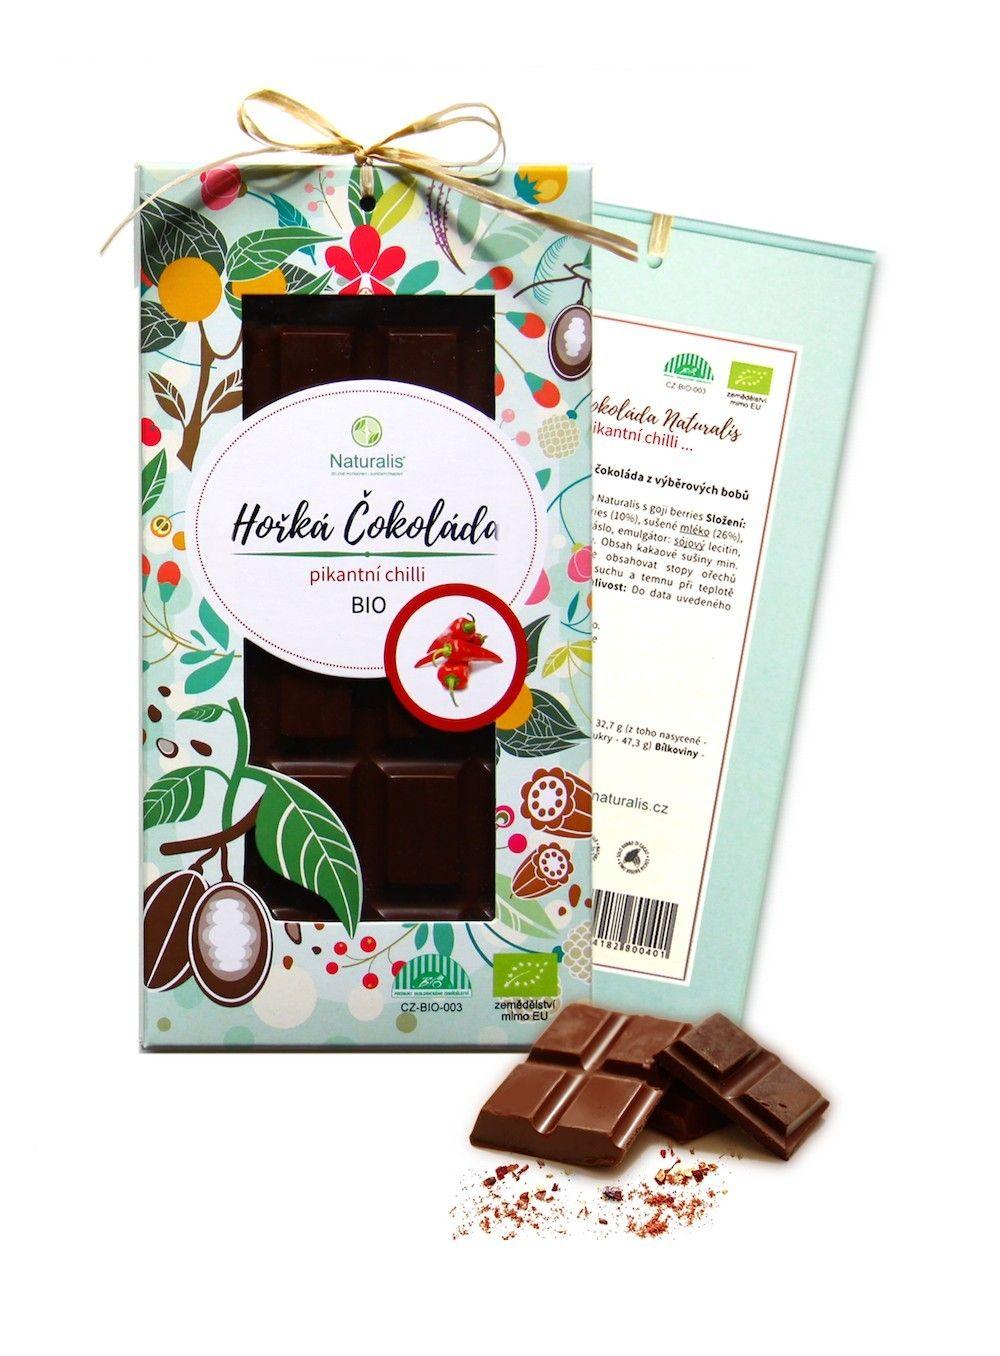 BIO Čokoláda Naturalis s chilli - 80g